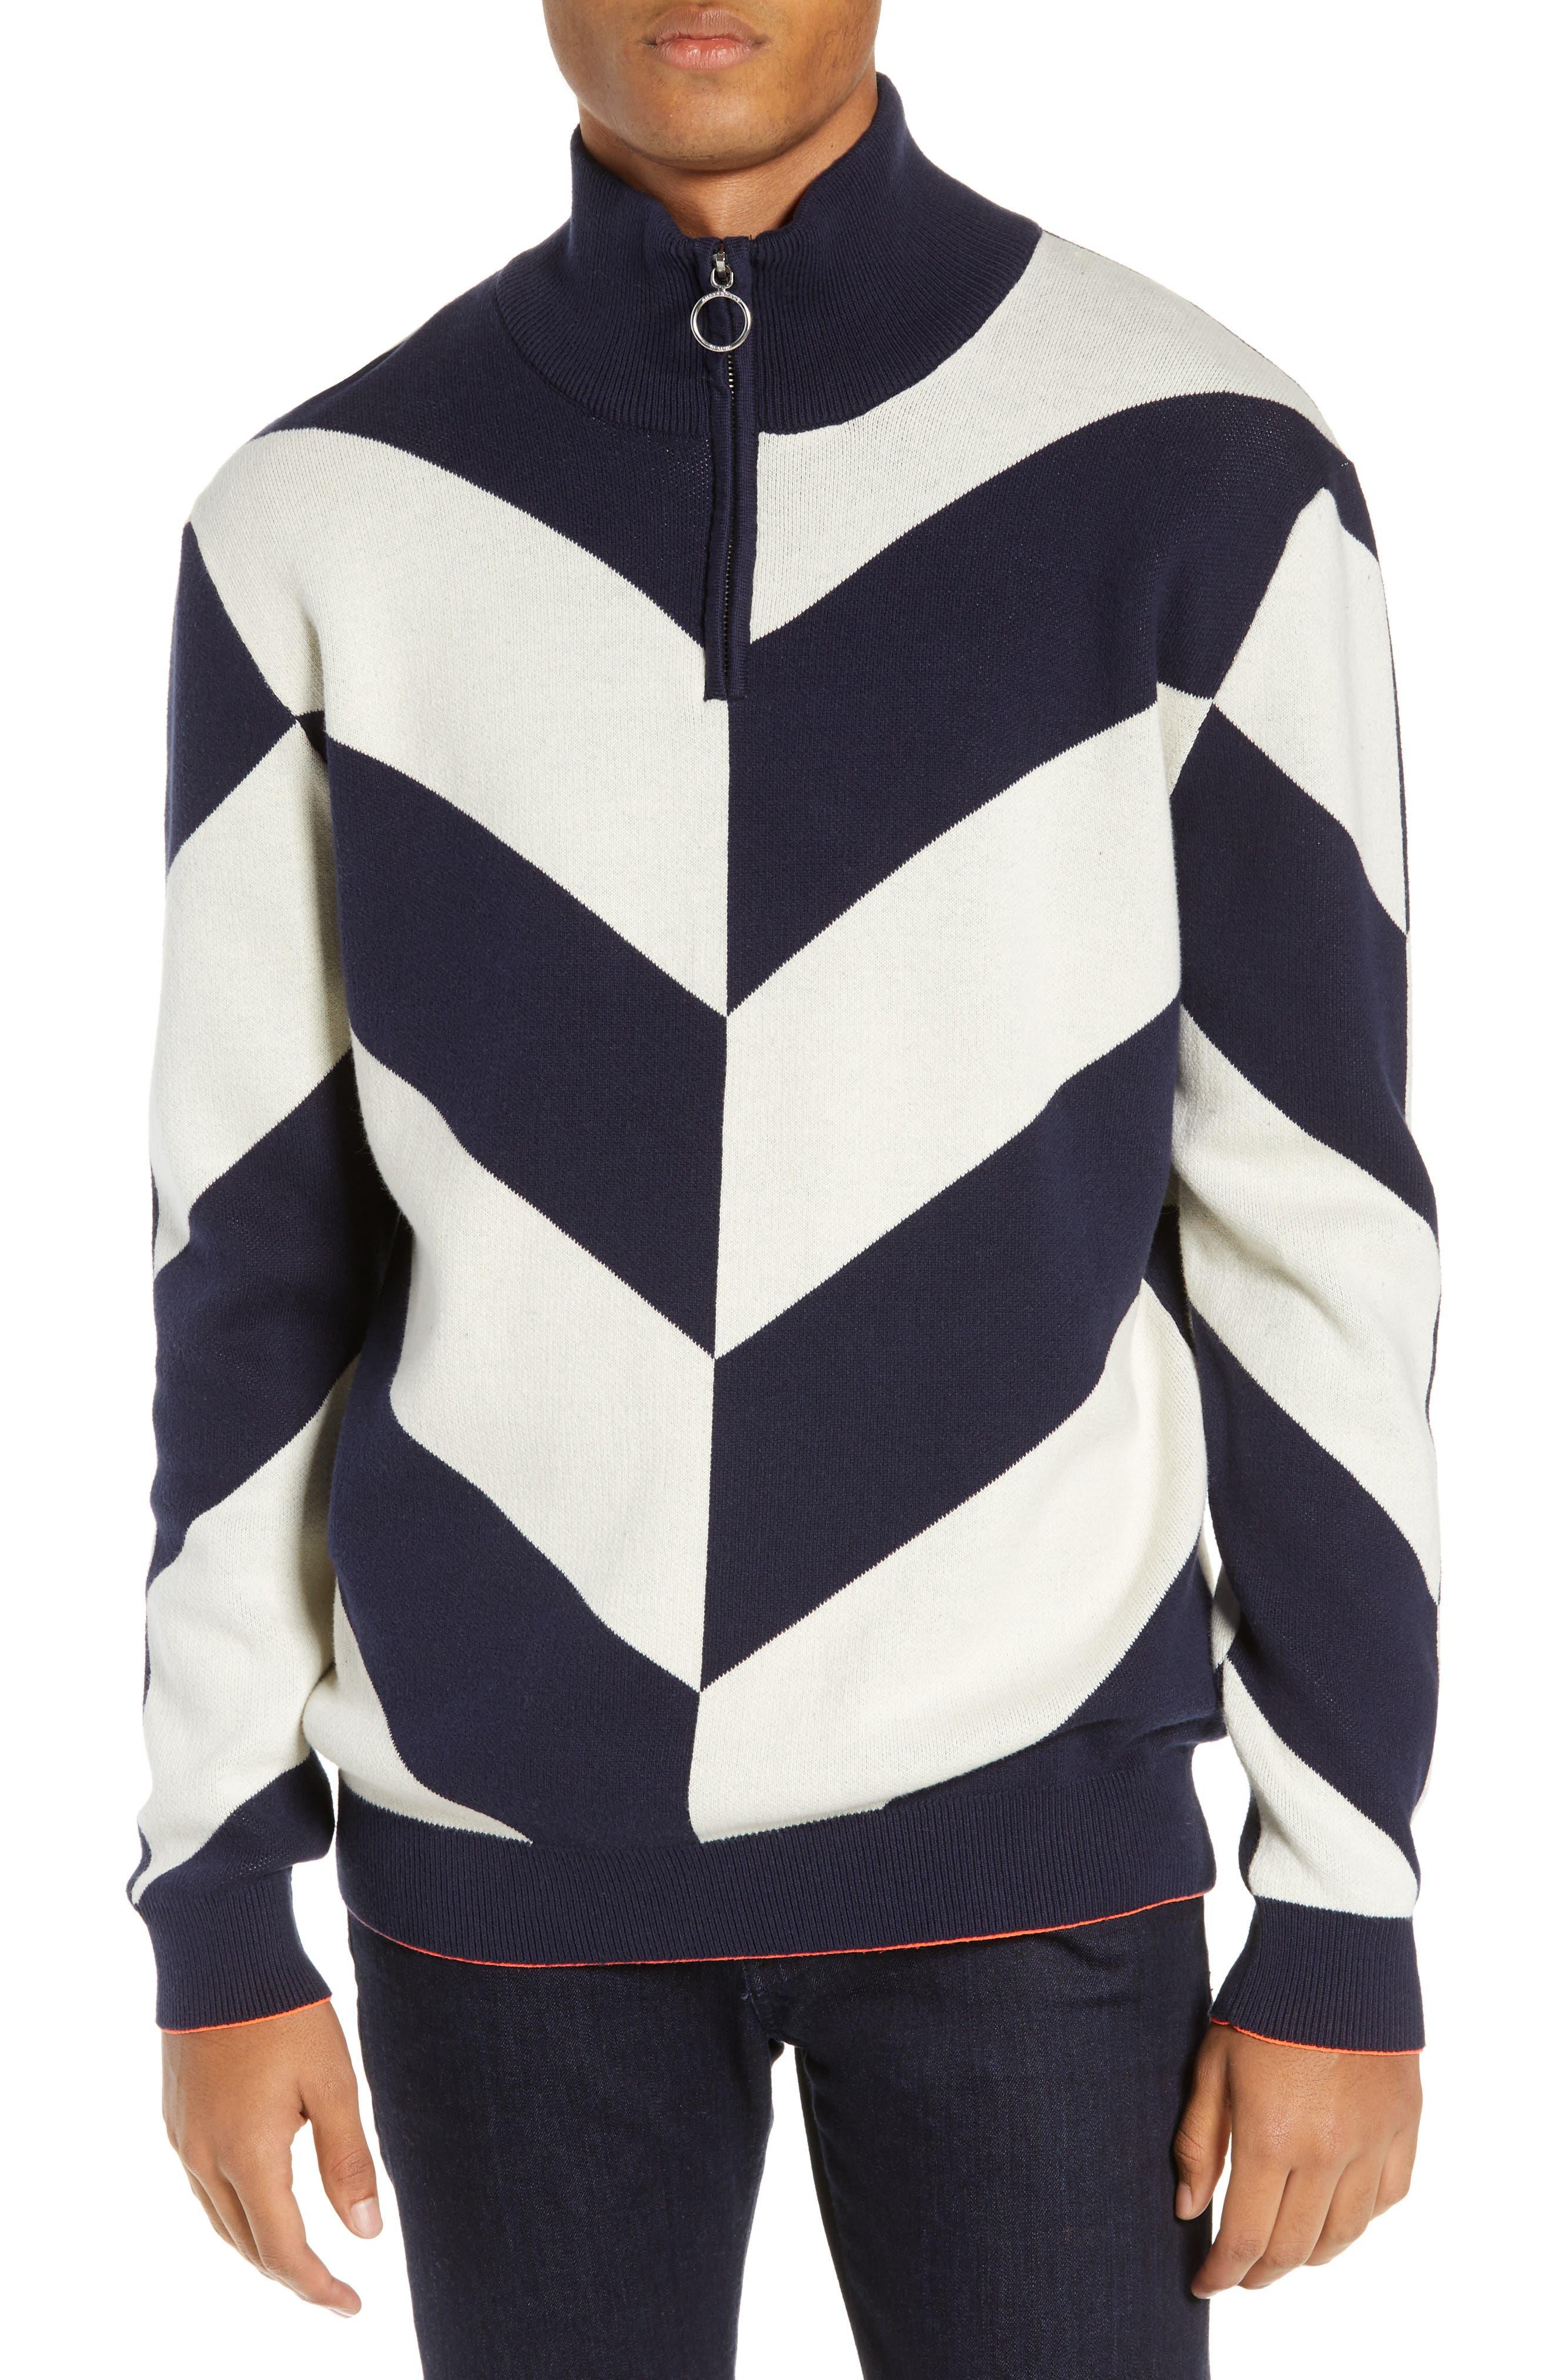 SCOTCH & SODA Alpine Colorblock Quarter Zip Pullover in Blue Combo